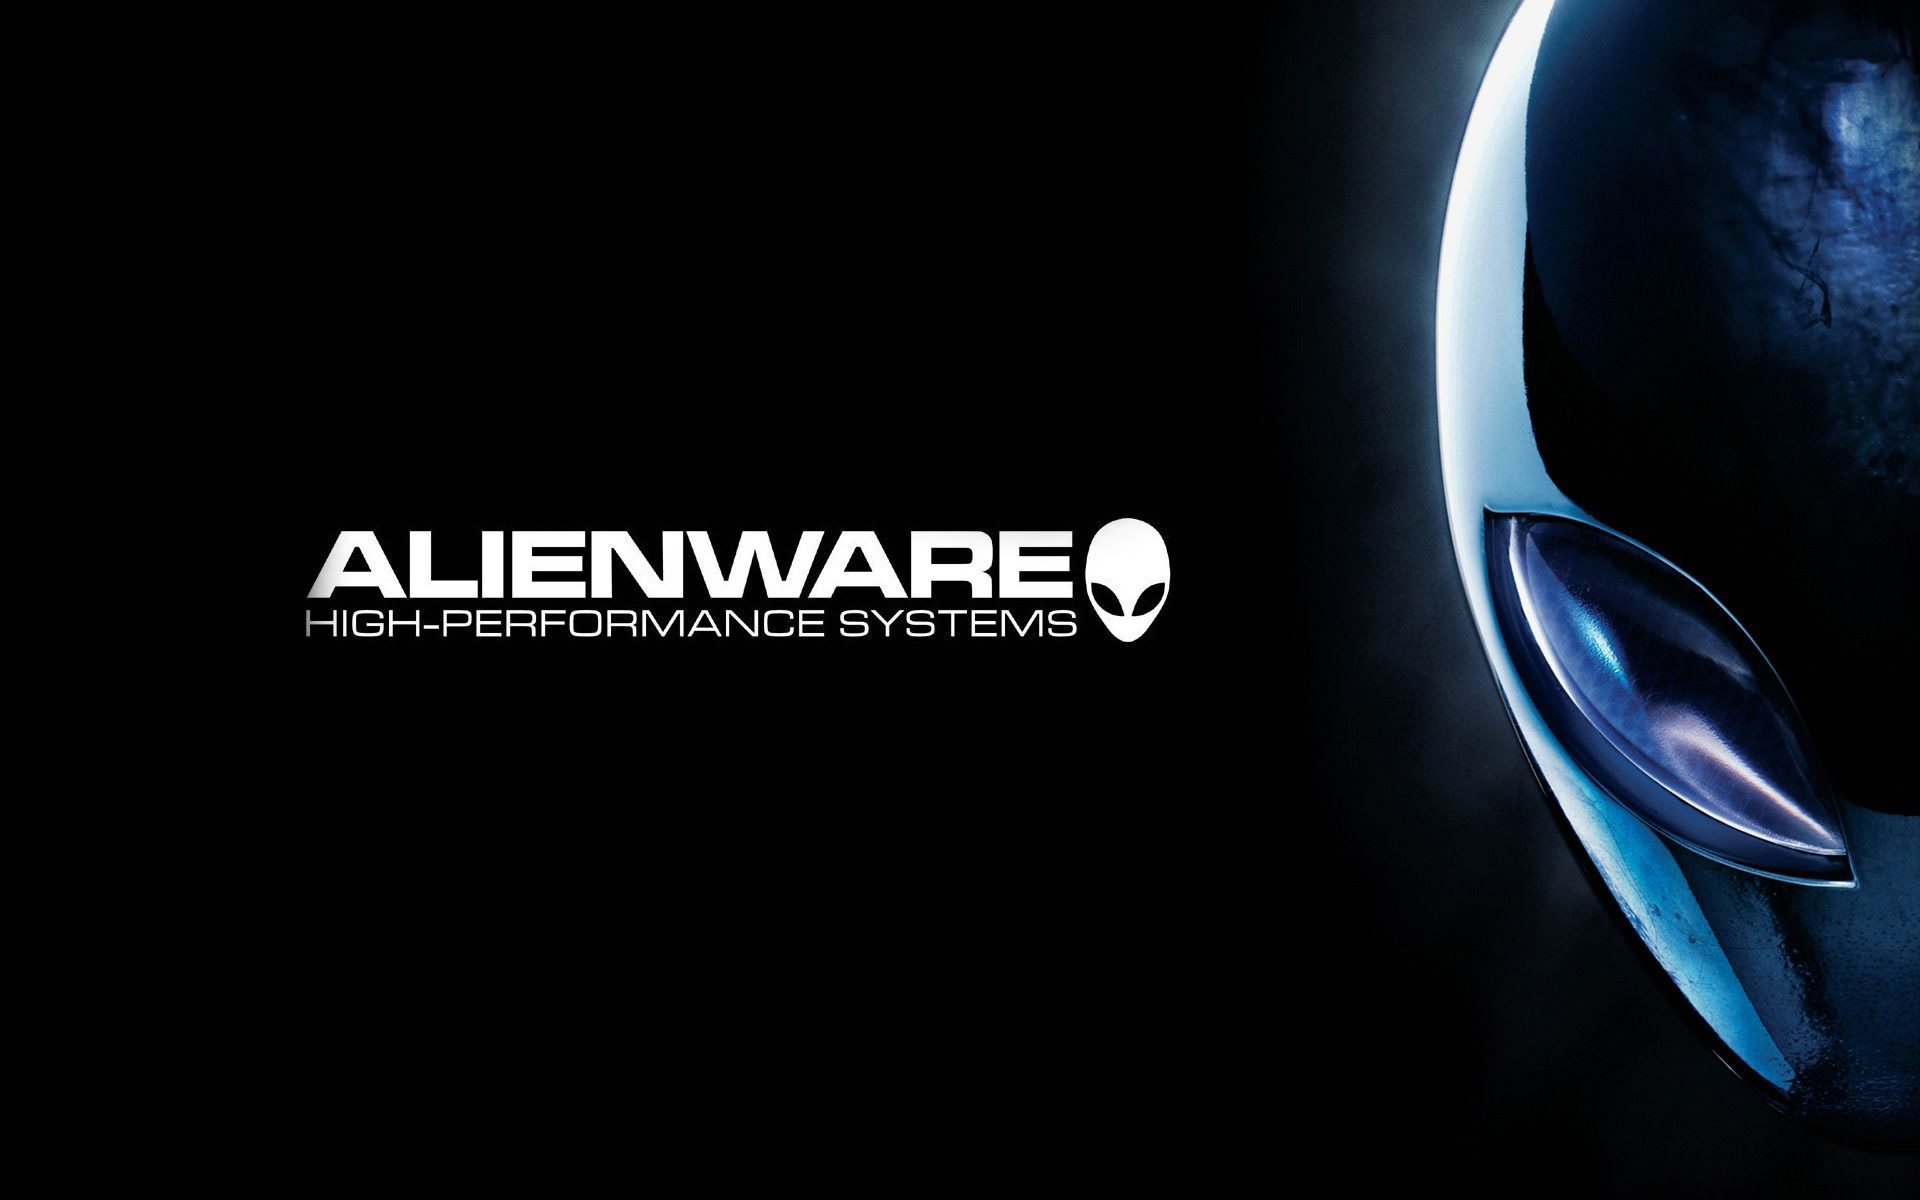 alienware-logo-pictures-20-spectacular